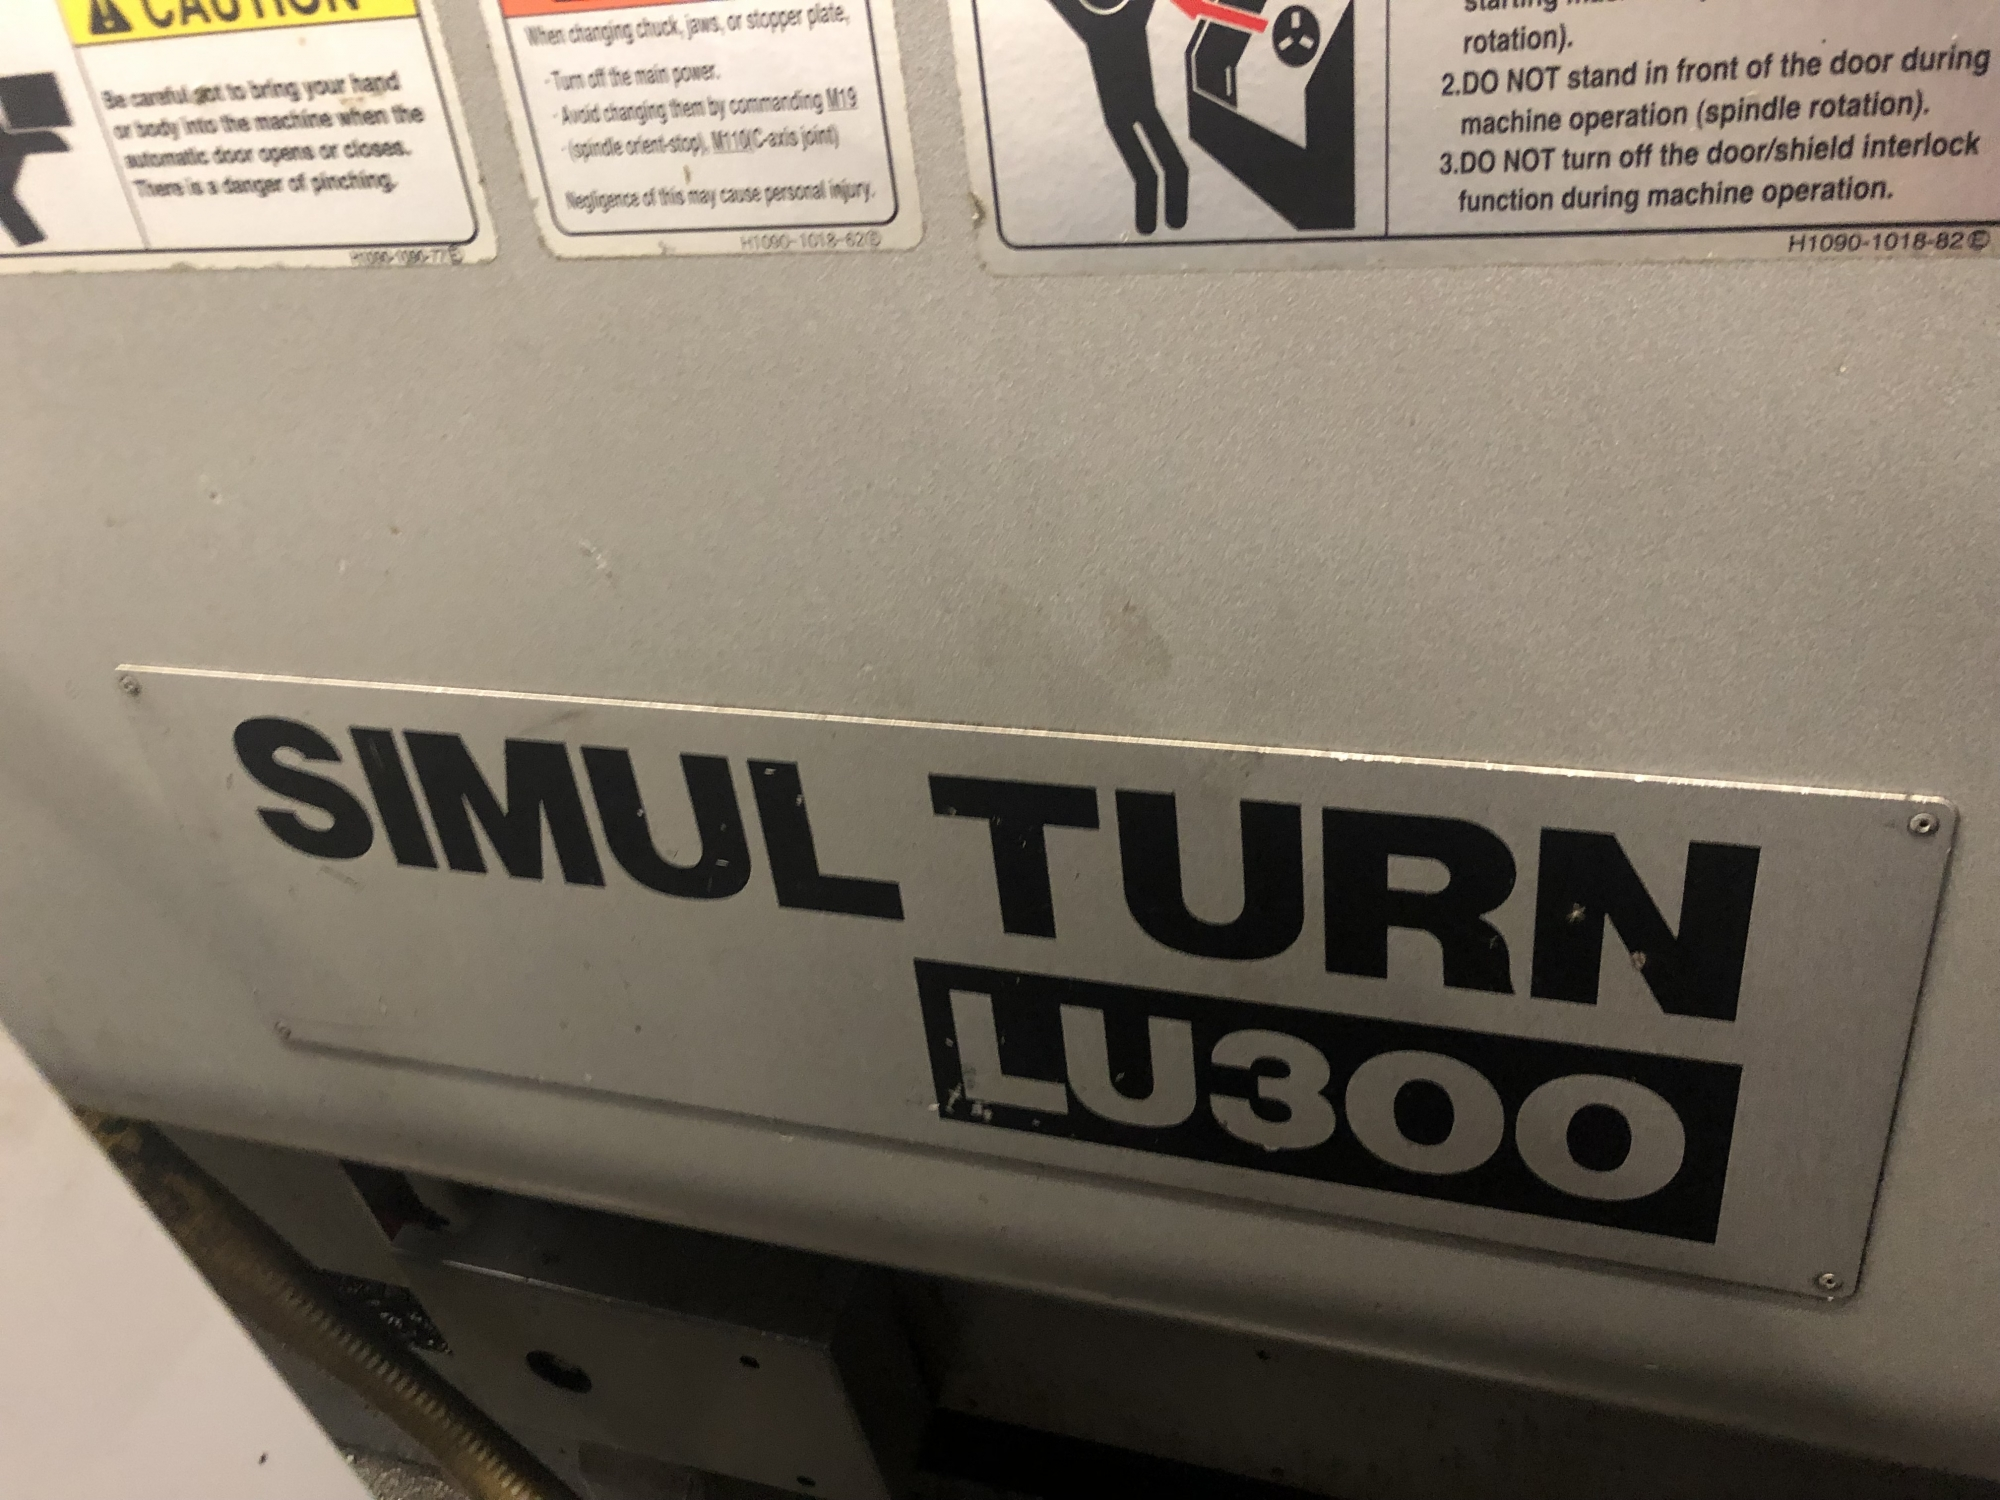 2009 OKUMA SimulTurn LU300/1000 - CNC Horizontal Lathe